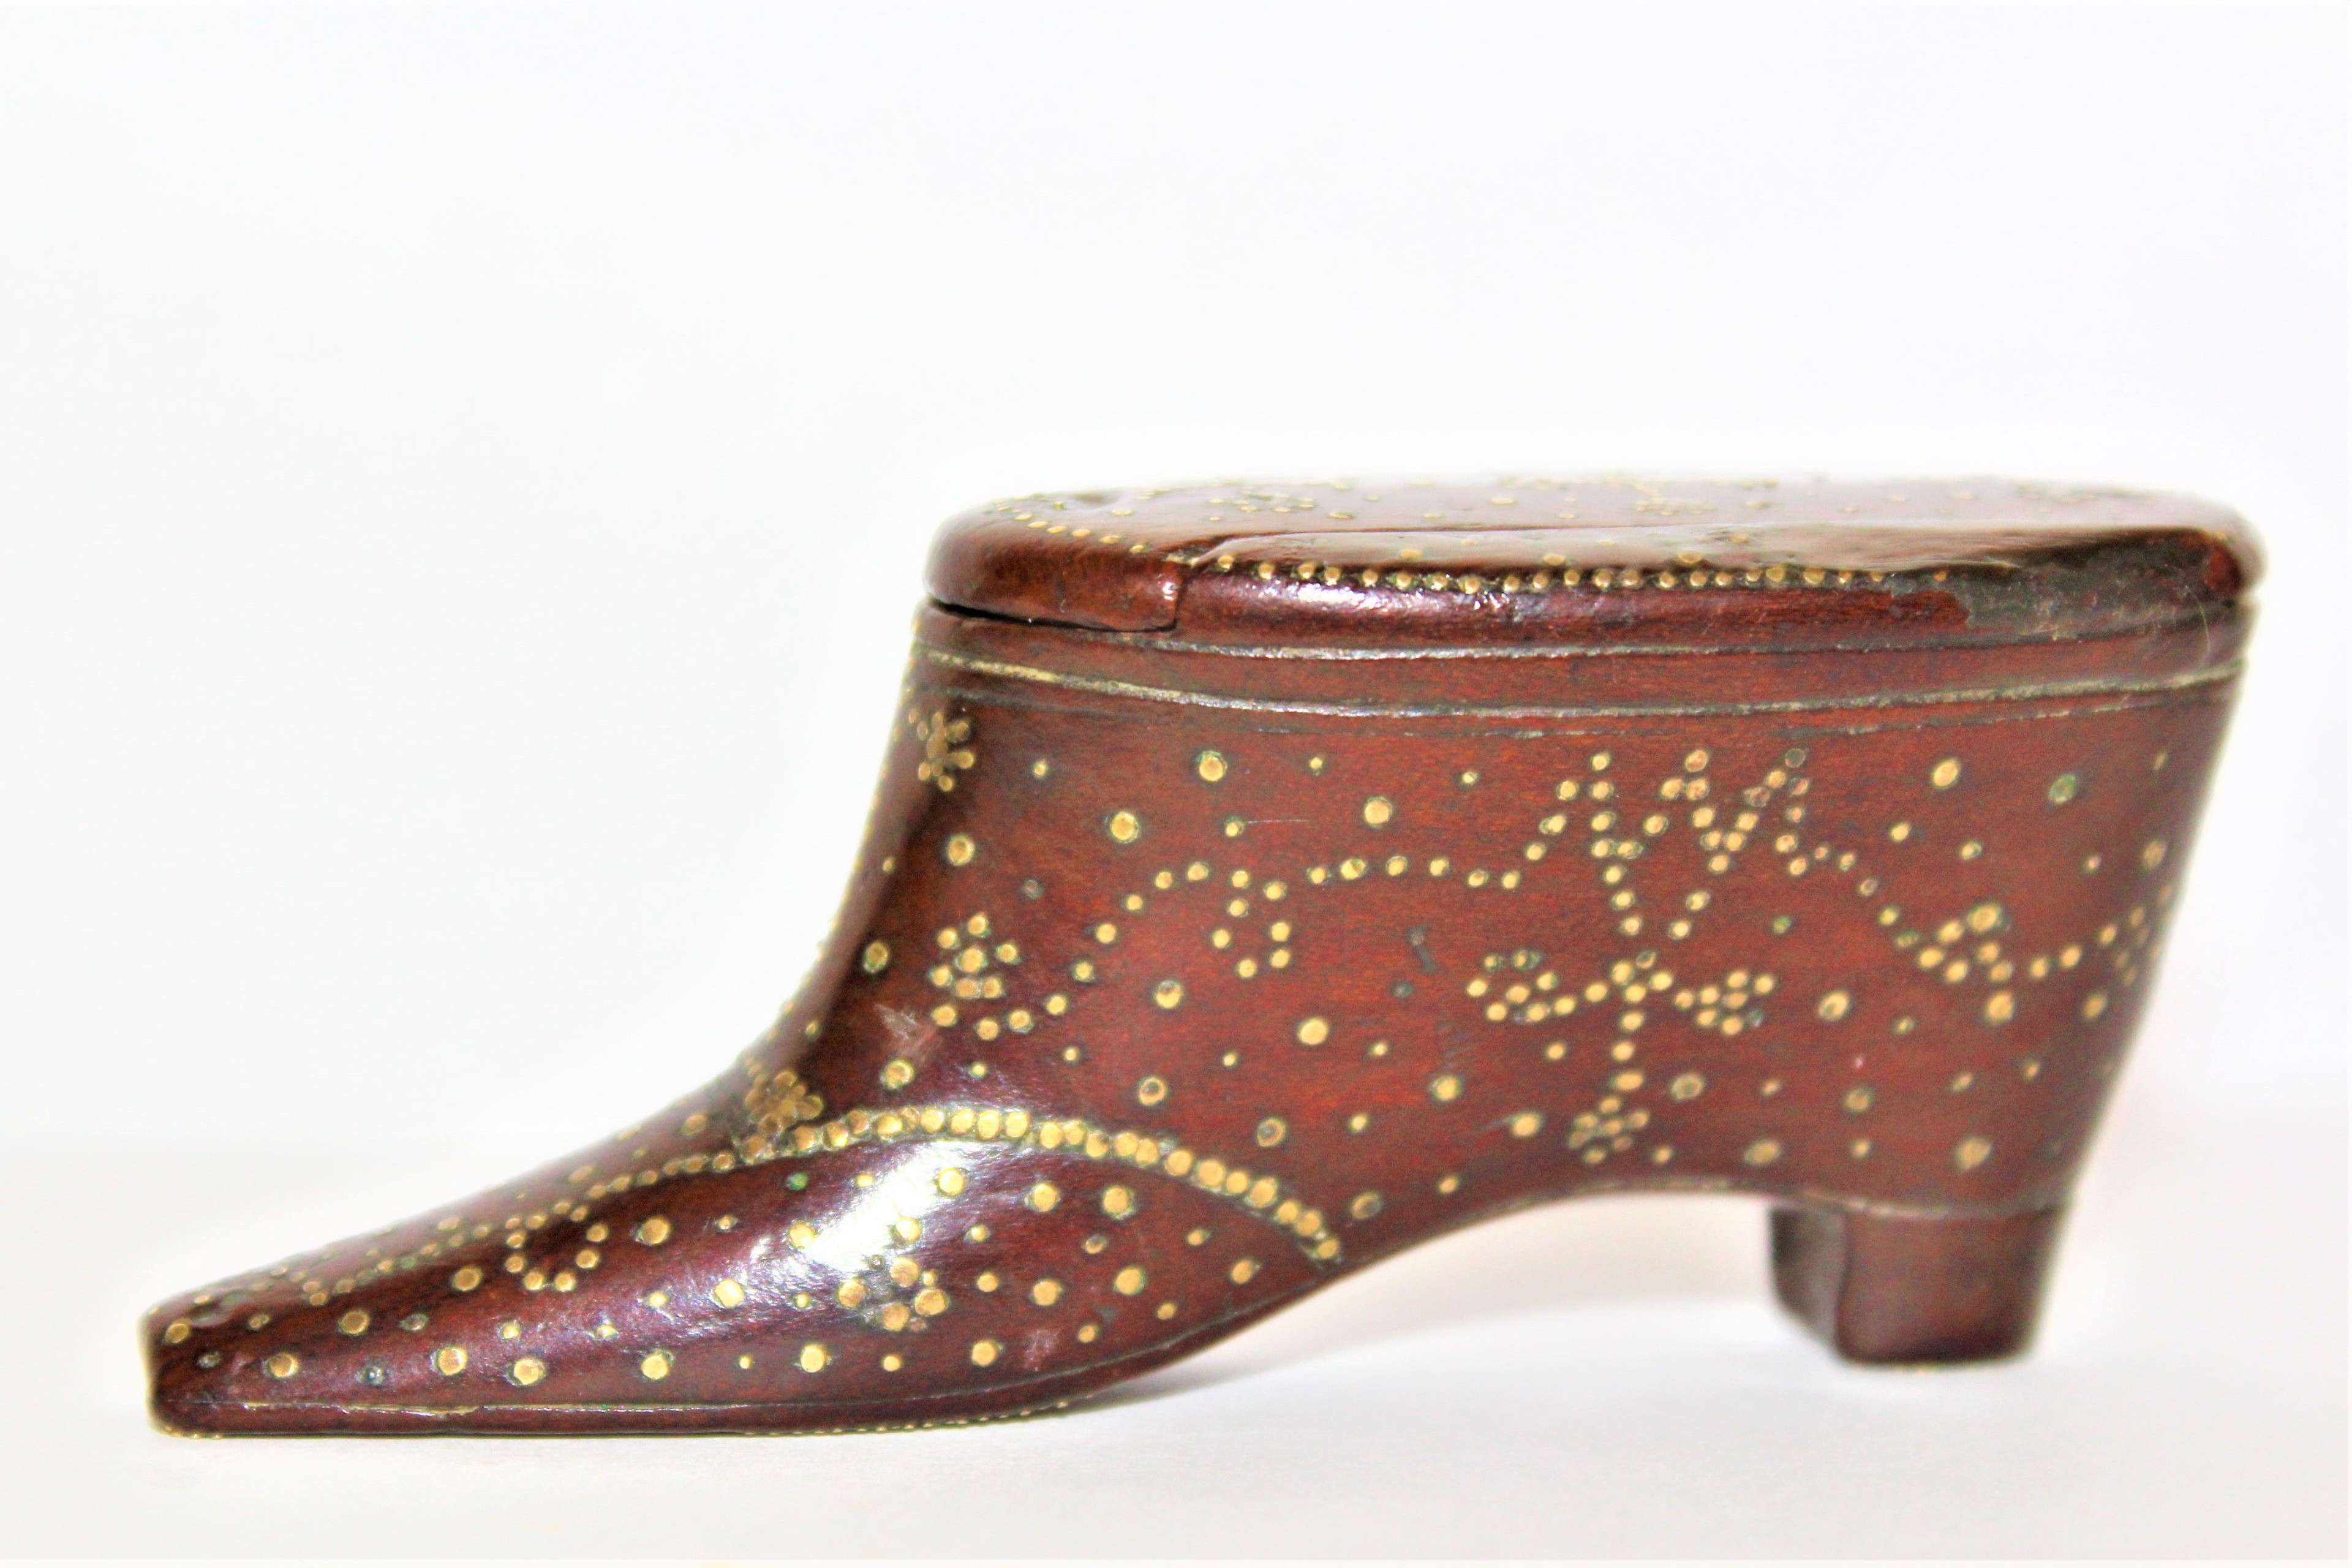 A very fine Georgian mahogany snuff box in the shape of a shoe